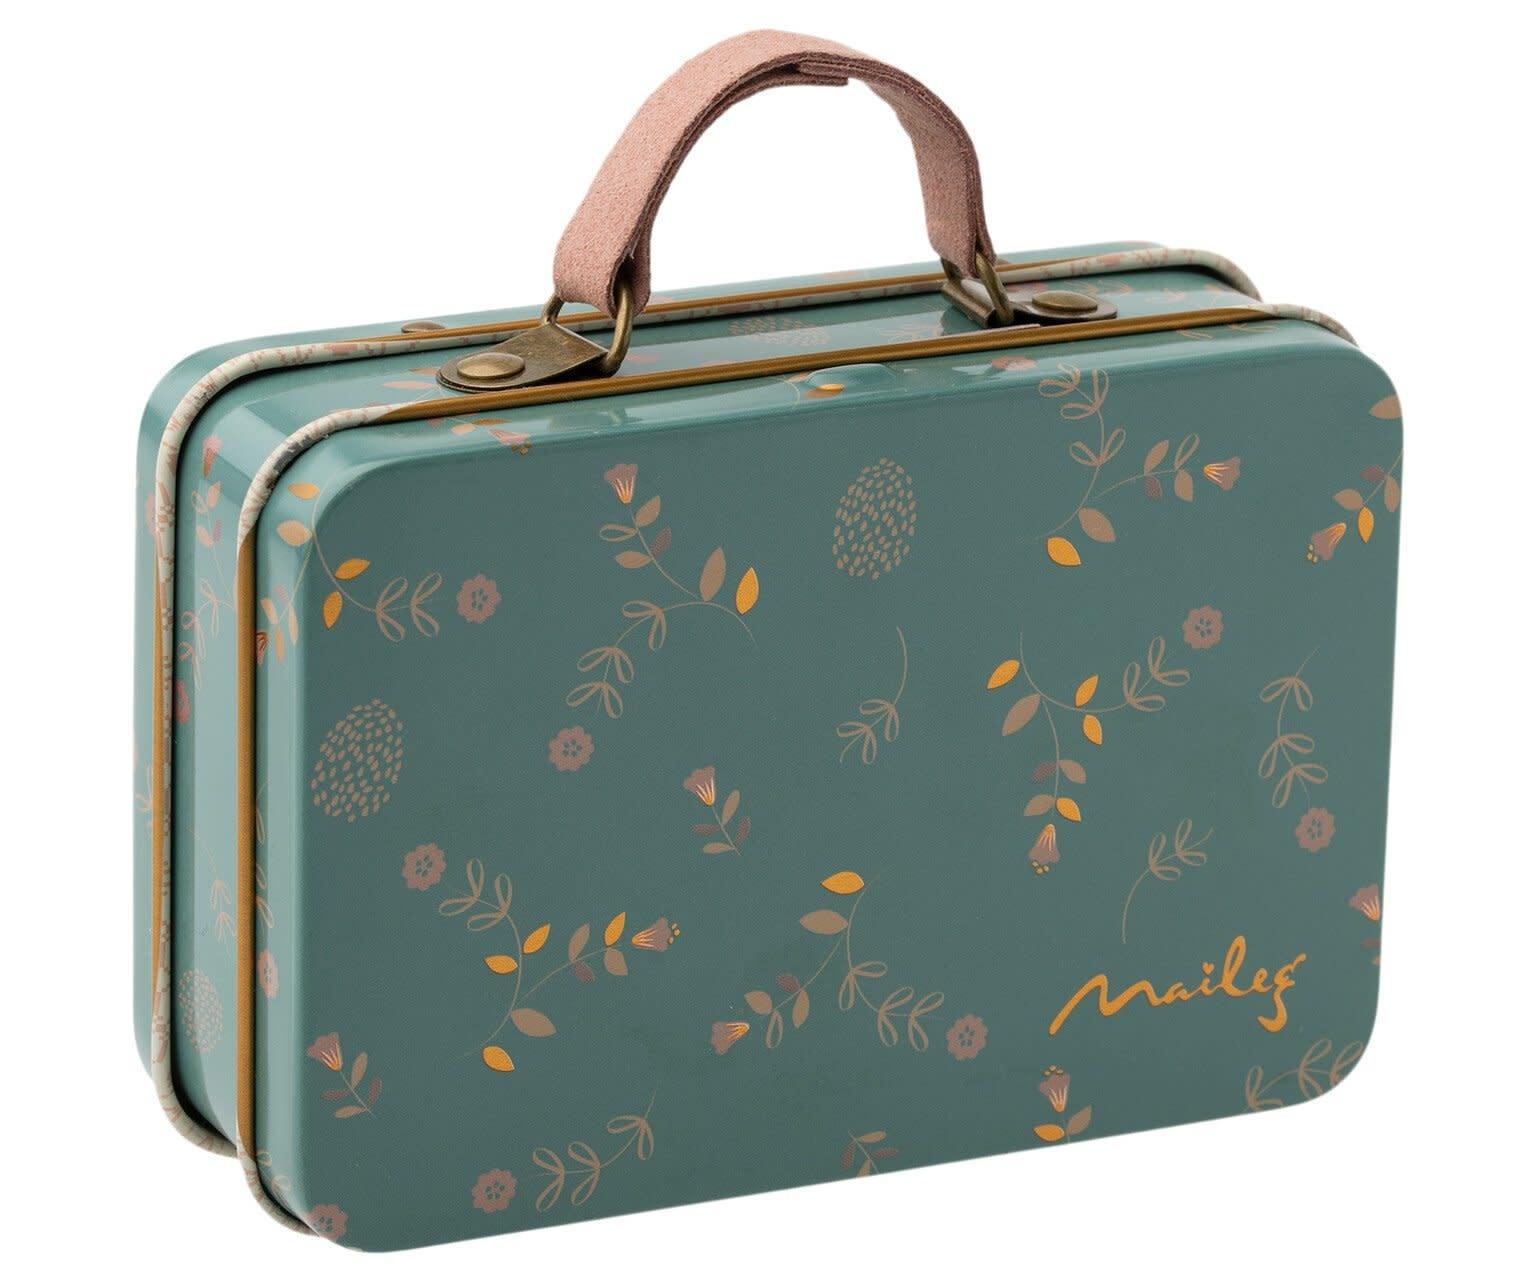 Maileg Travel Suitcase Elia